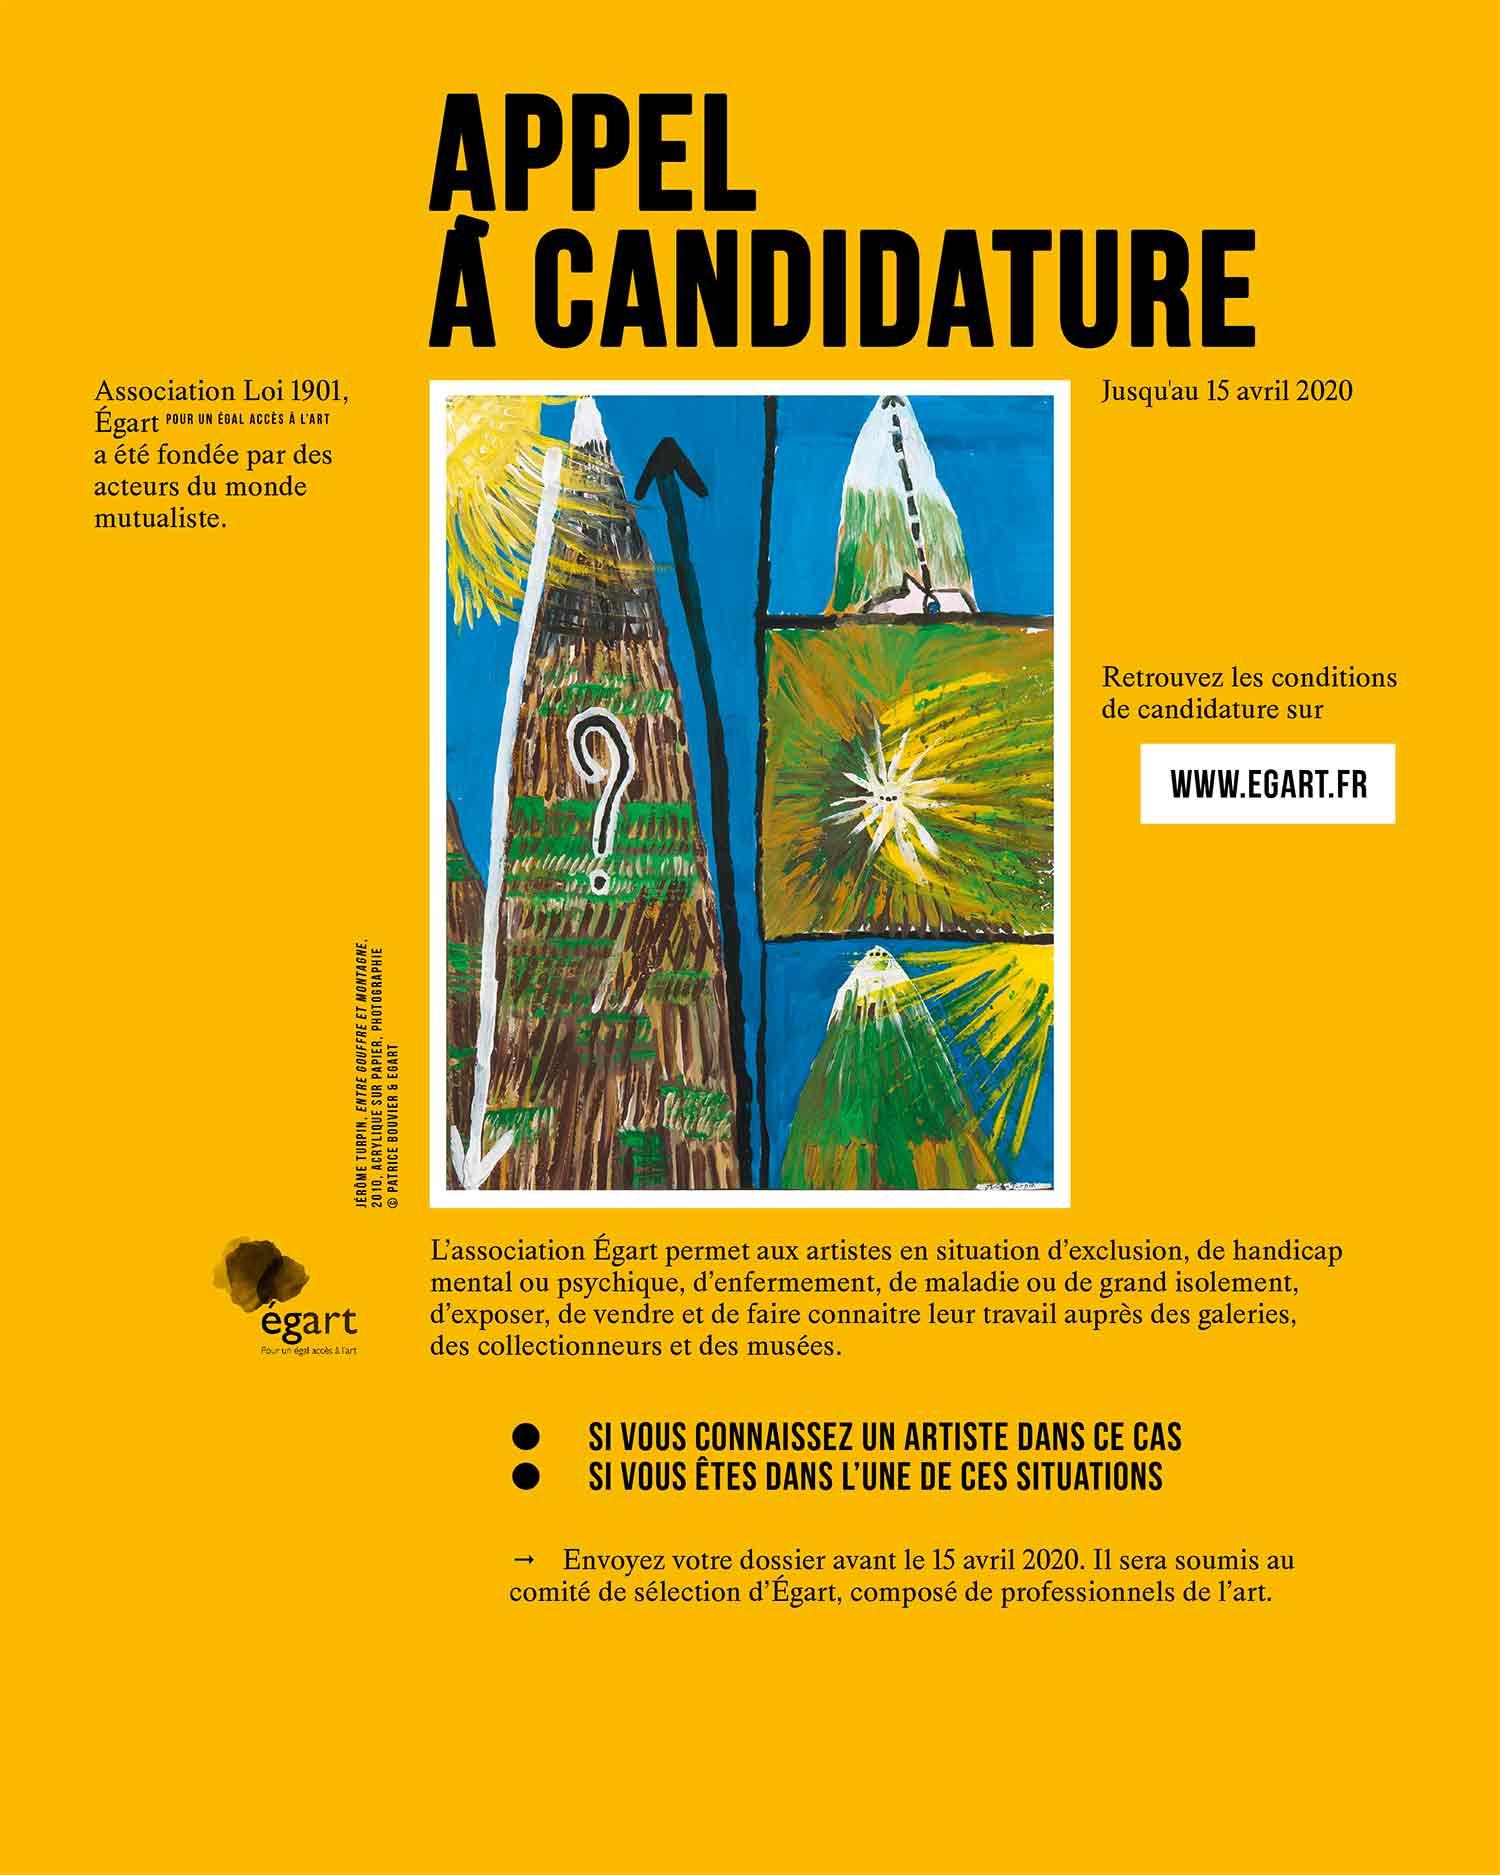 APPEL CANDIDATURES EGART 2020